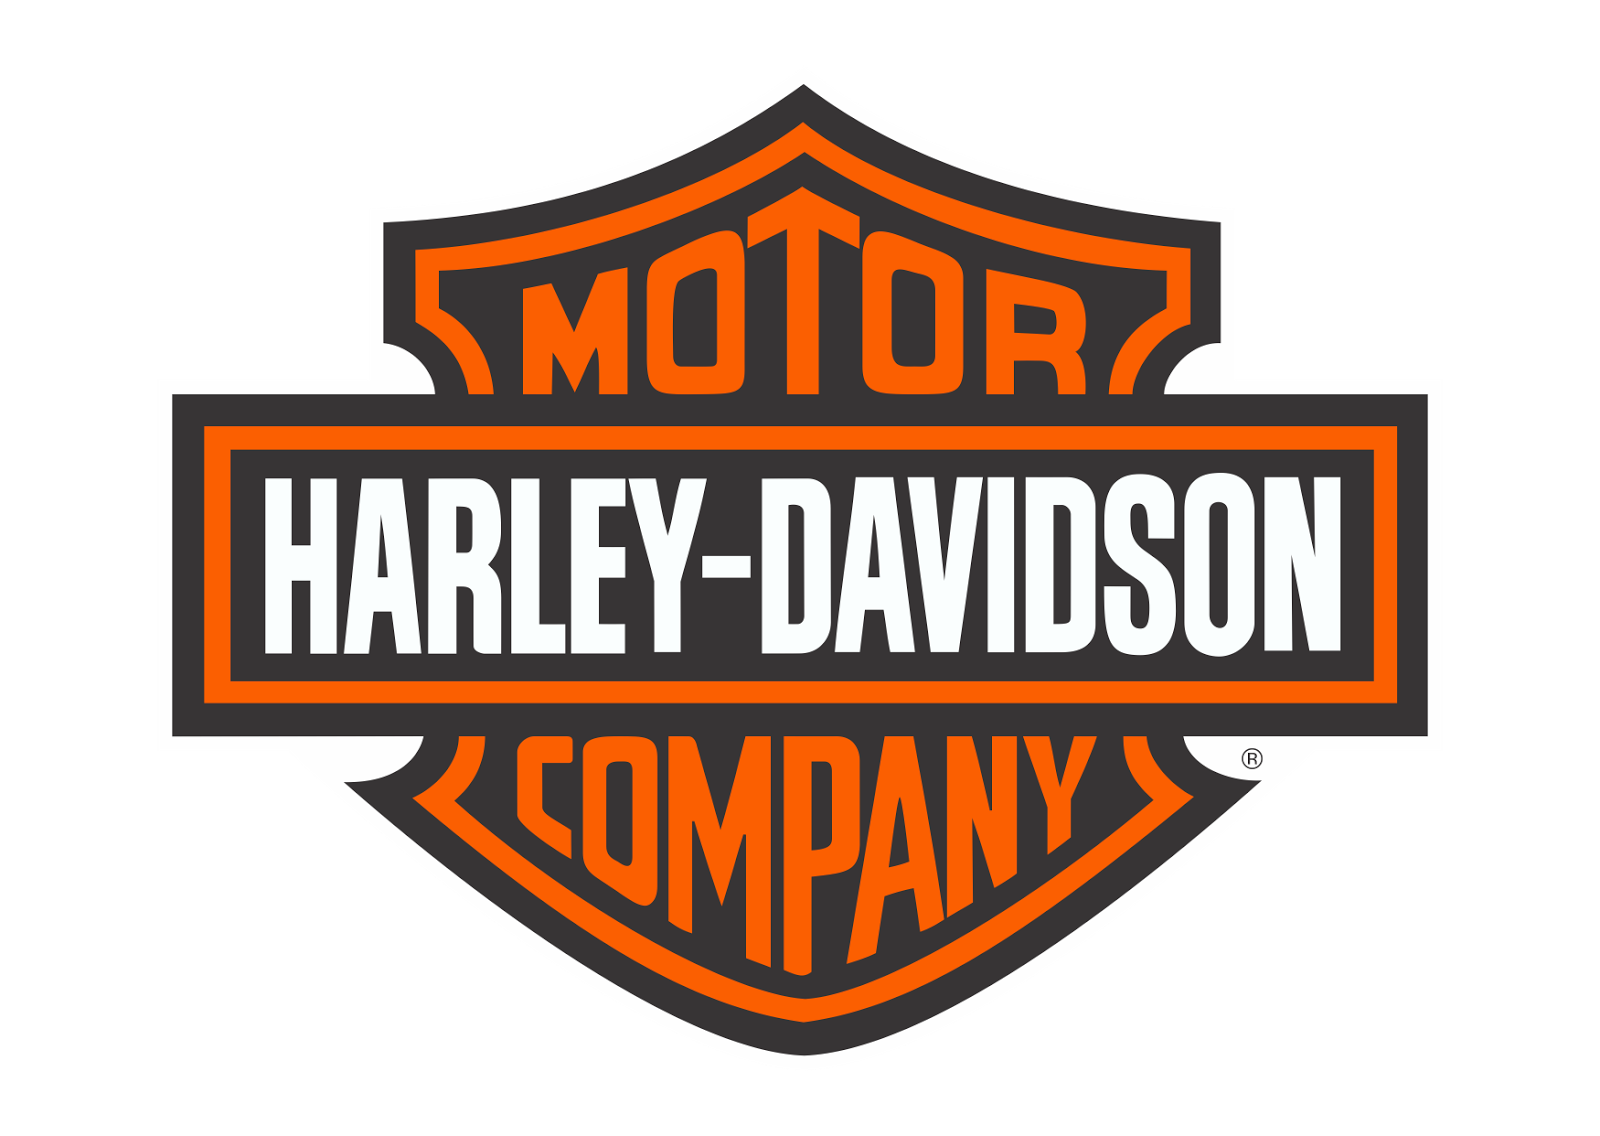 Download Free Harley Davidson Logo Graphics Vectors And Other Types Of Harley Davidson Logo Graphics Graphics And Clipart At Oogazone!harley Davidson Vector Hdpng.com  - Harley Davidson Vector, Transparent background PNG HD thumbnail